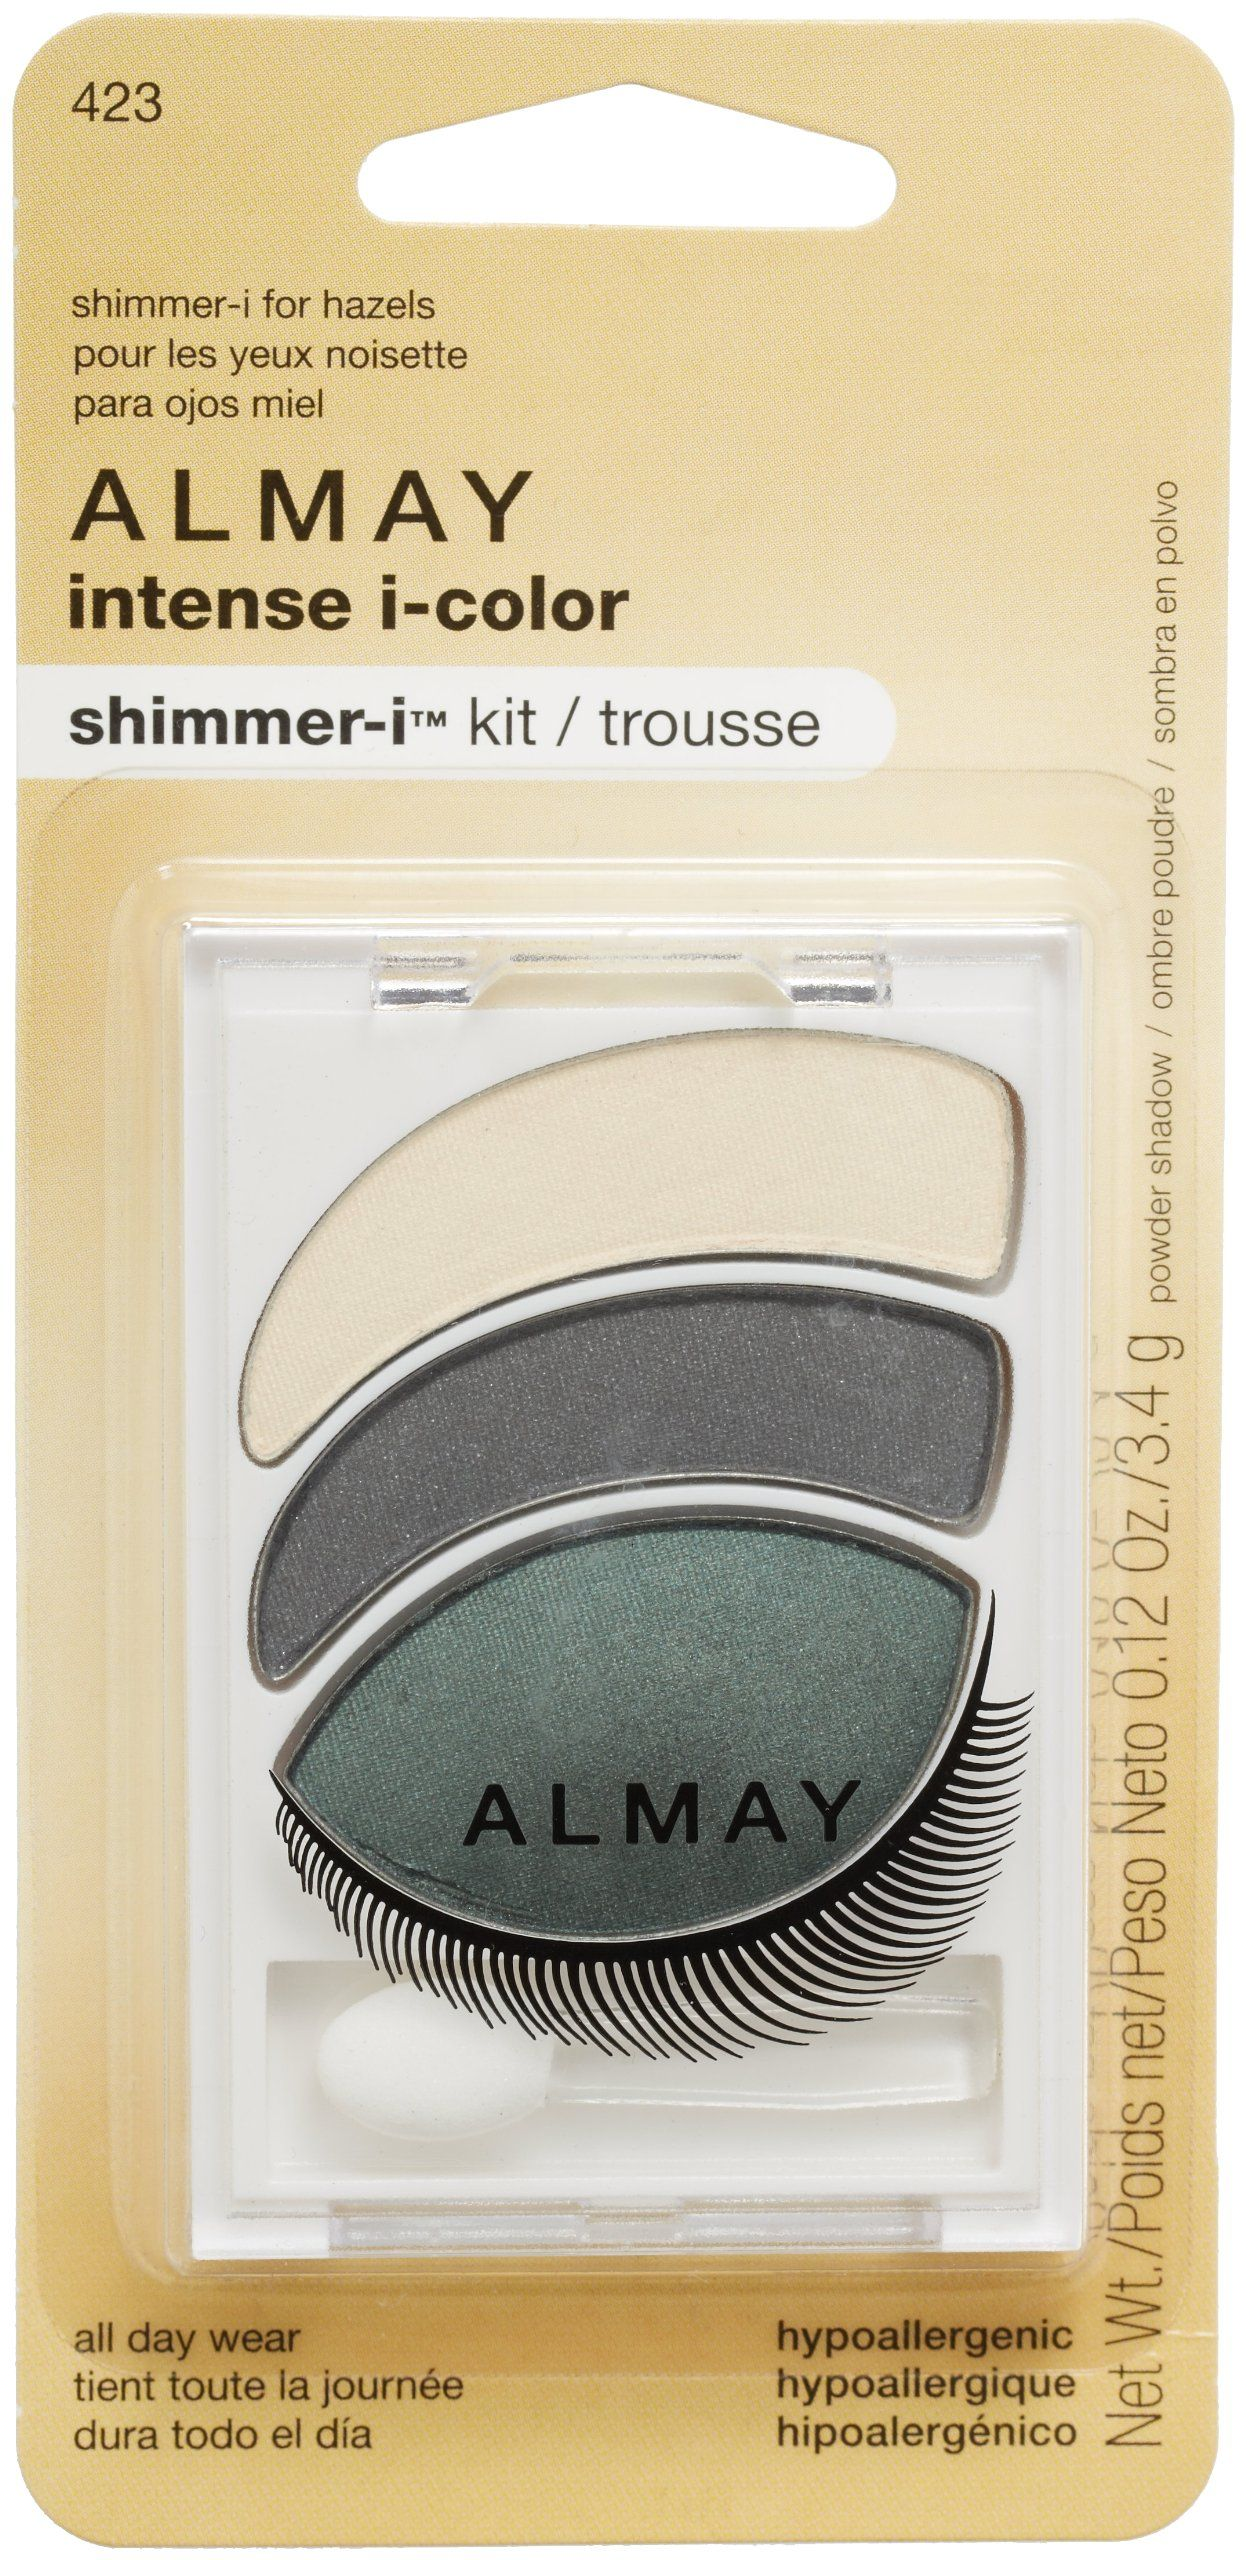 almay intense icolor shimmeri kit hazel >>> details can be